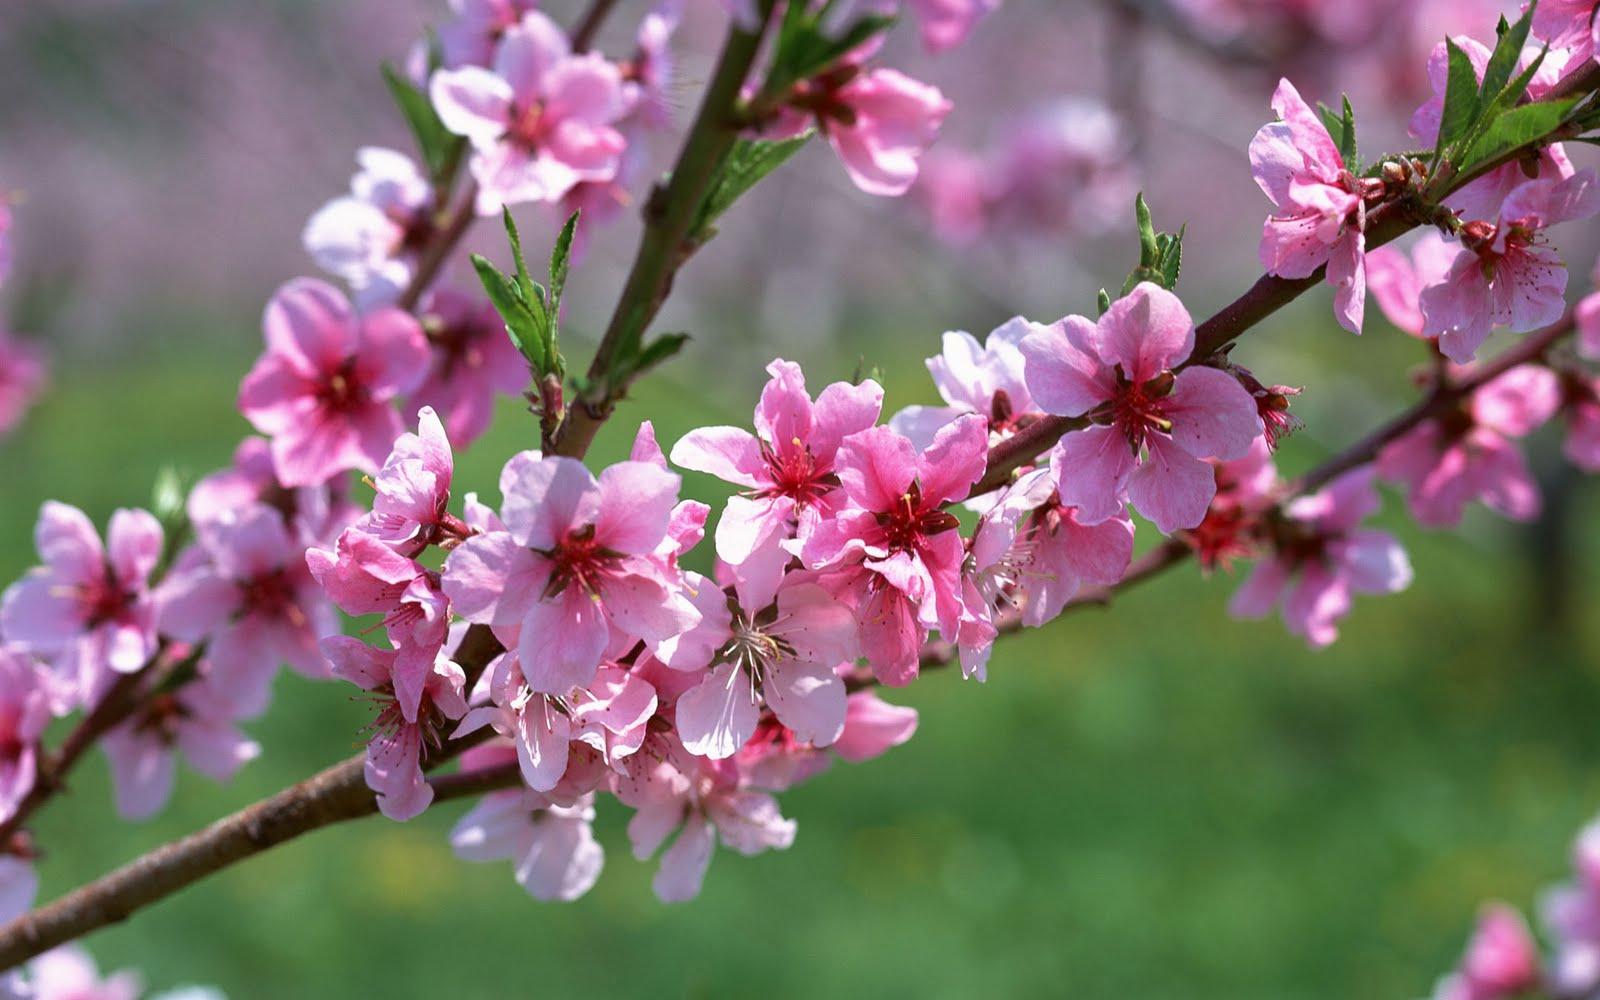 http://2.bp.blogspot.com/_2UbsSBz9ckE/S2joFOlj0_I/AAAAAAAAAvw/KhL4aNoTs7U/s1600/Spring_Branch_1920x1200%20hd%20wallpaper.jpg